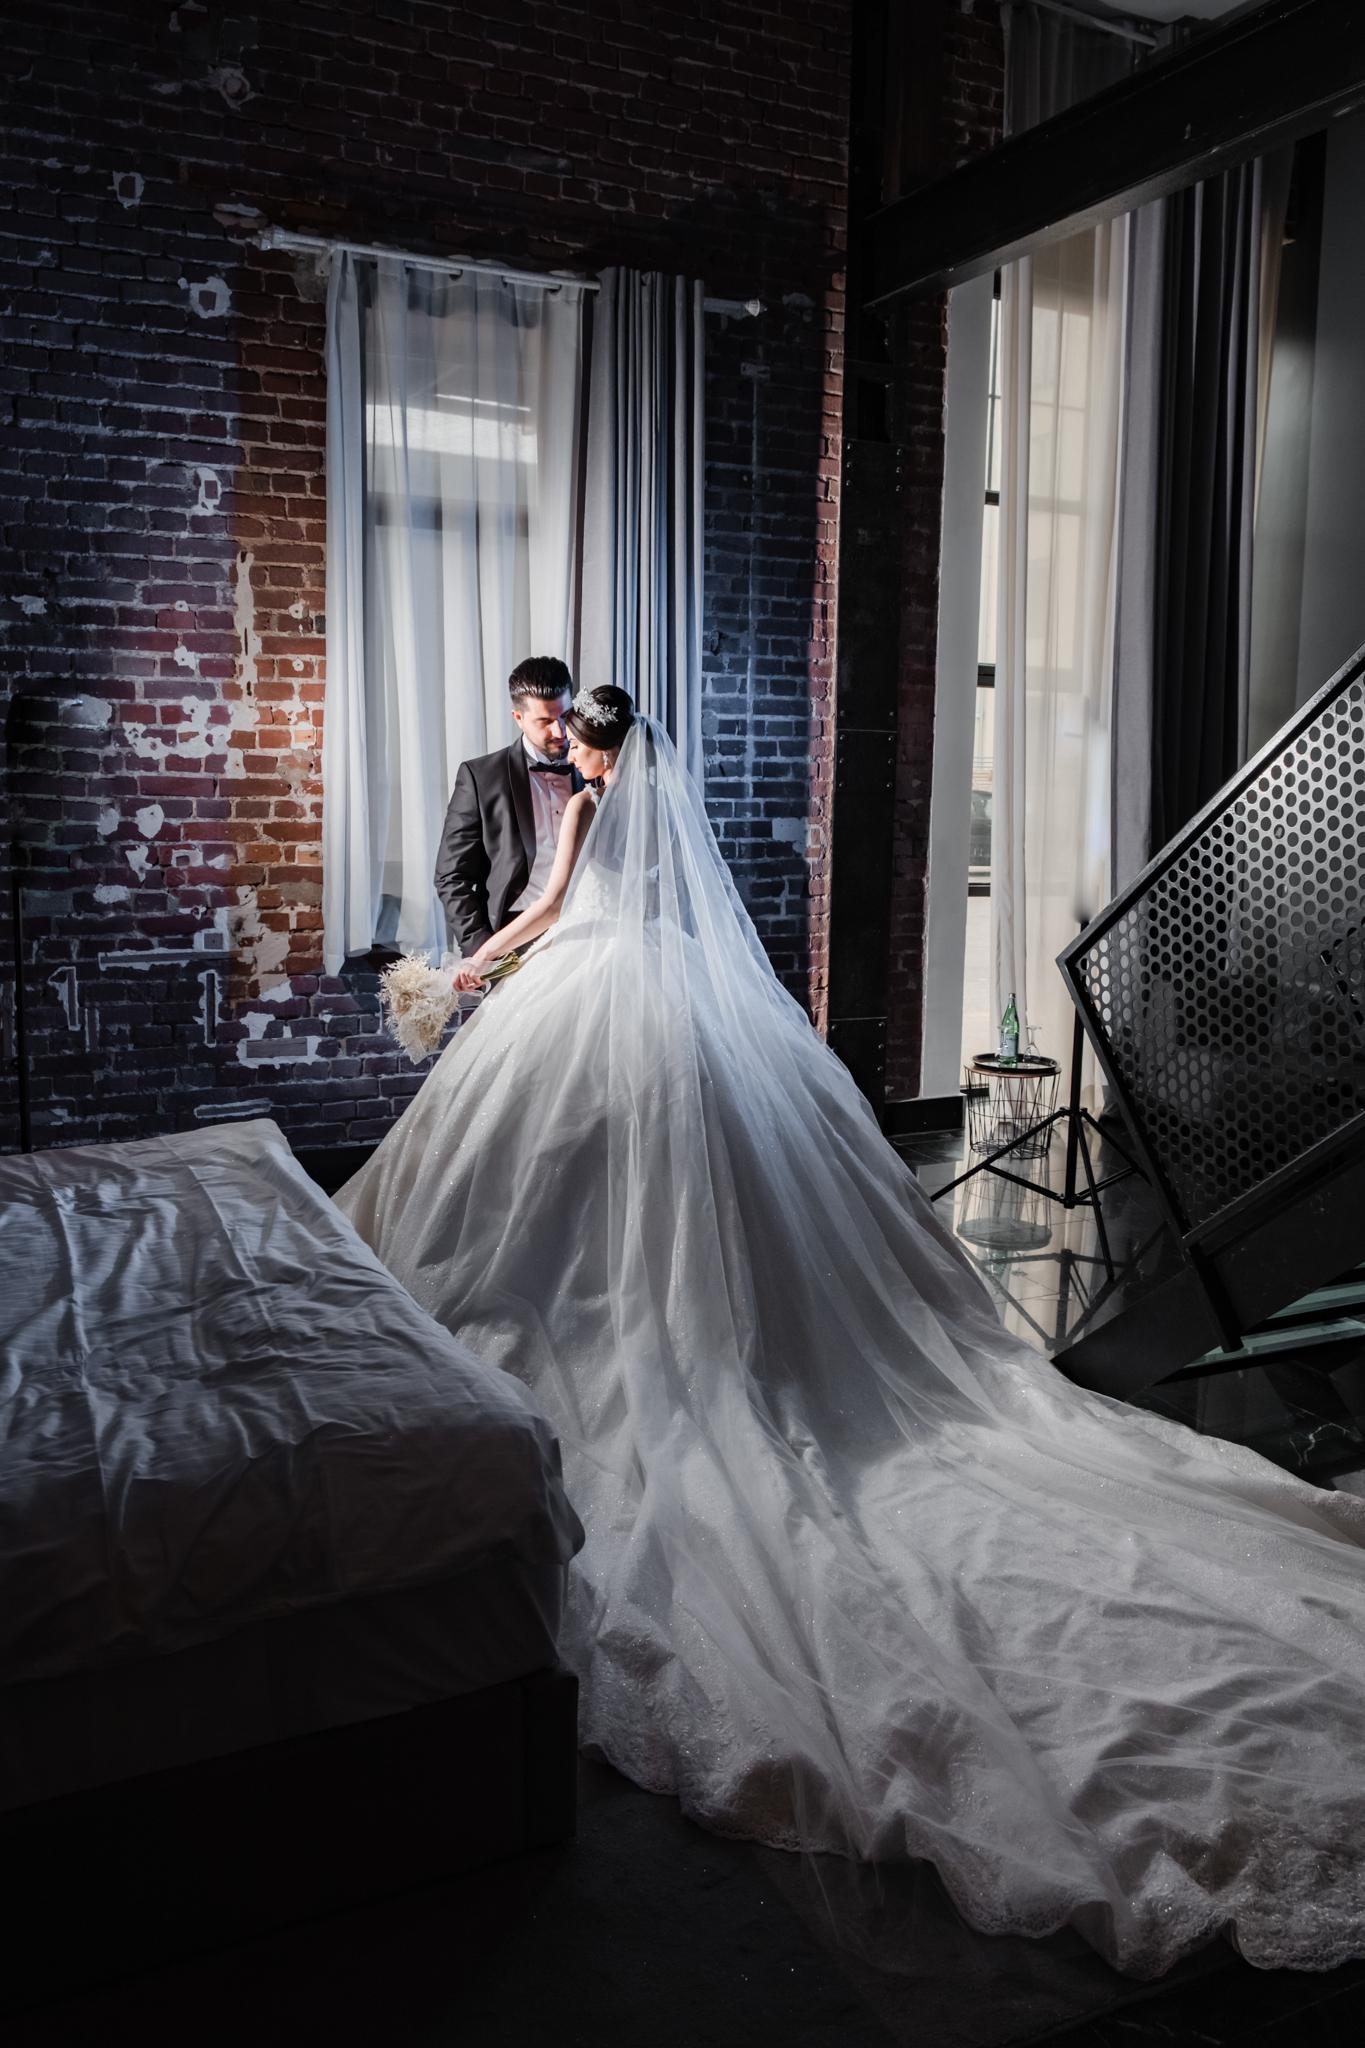 Hochzeitsfotograf Kamp-Lintfort